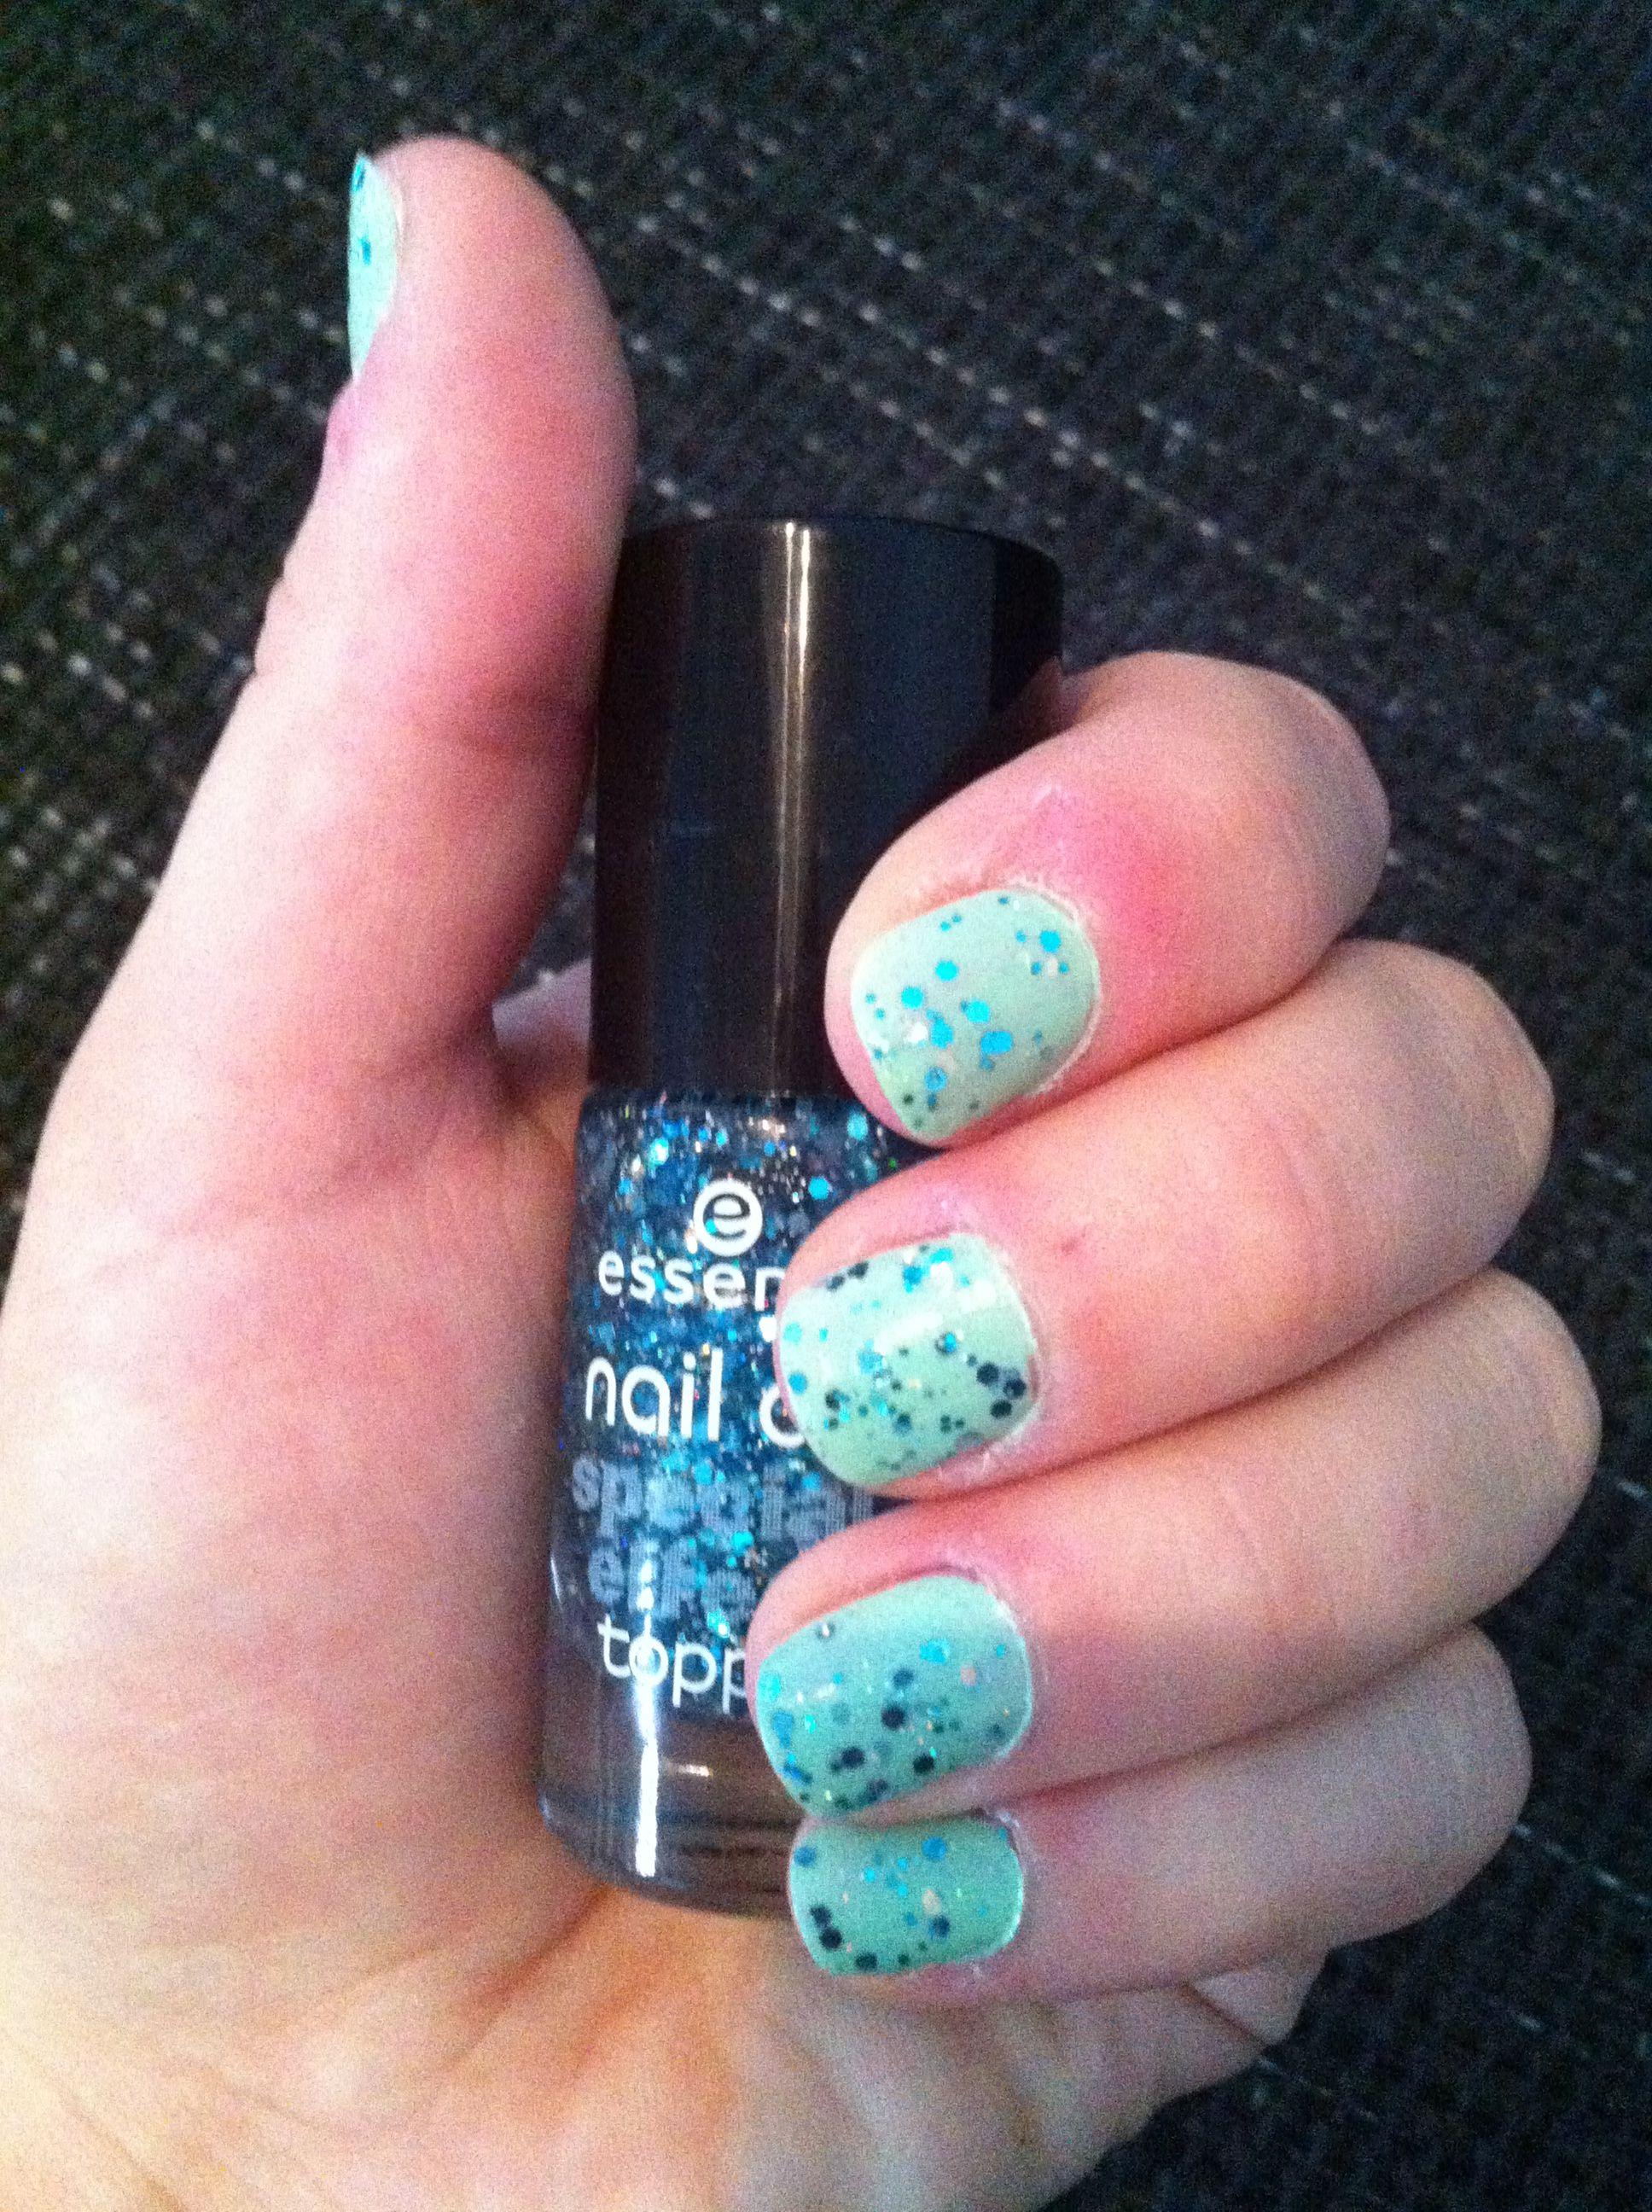 My own essence nail art nails pinterest